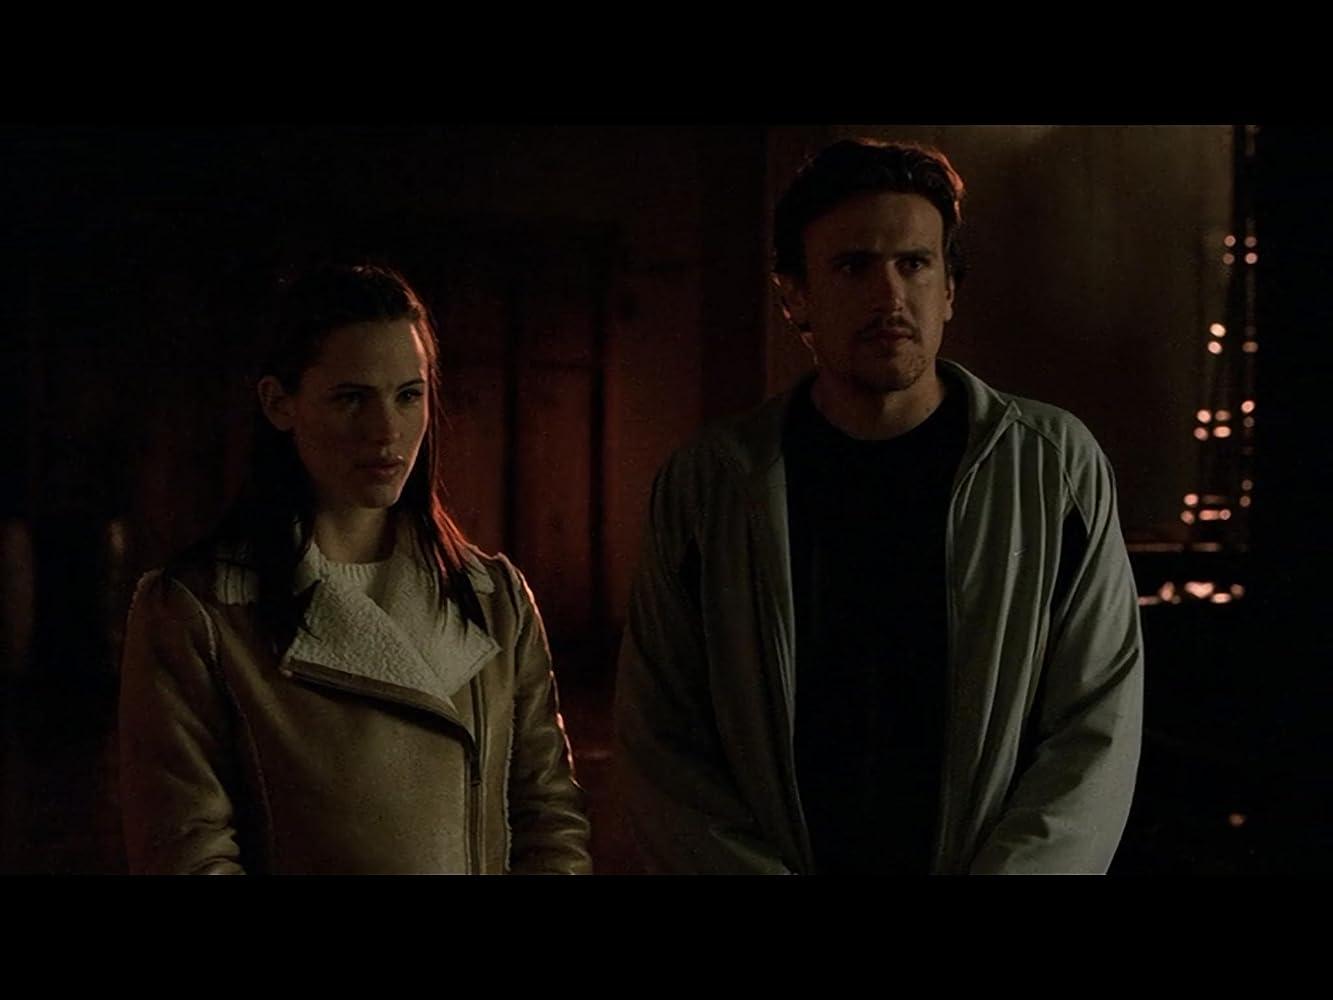 Jennifer Garner and Jason Segel in Alias (2001)